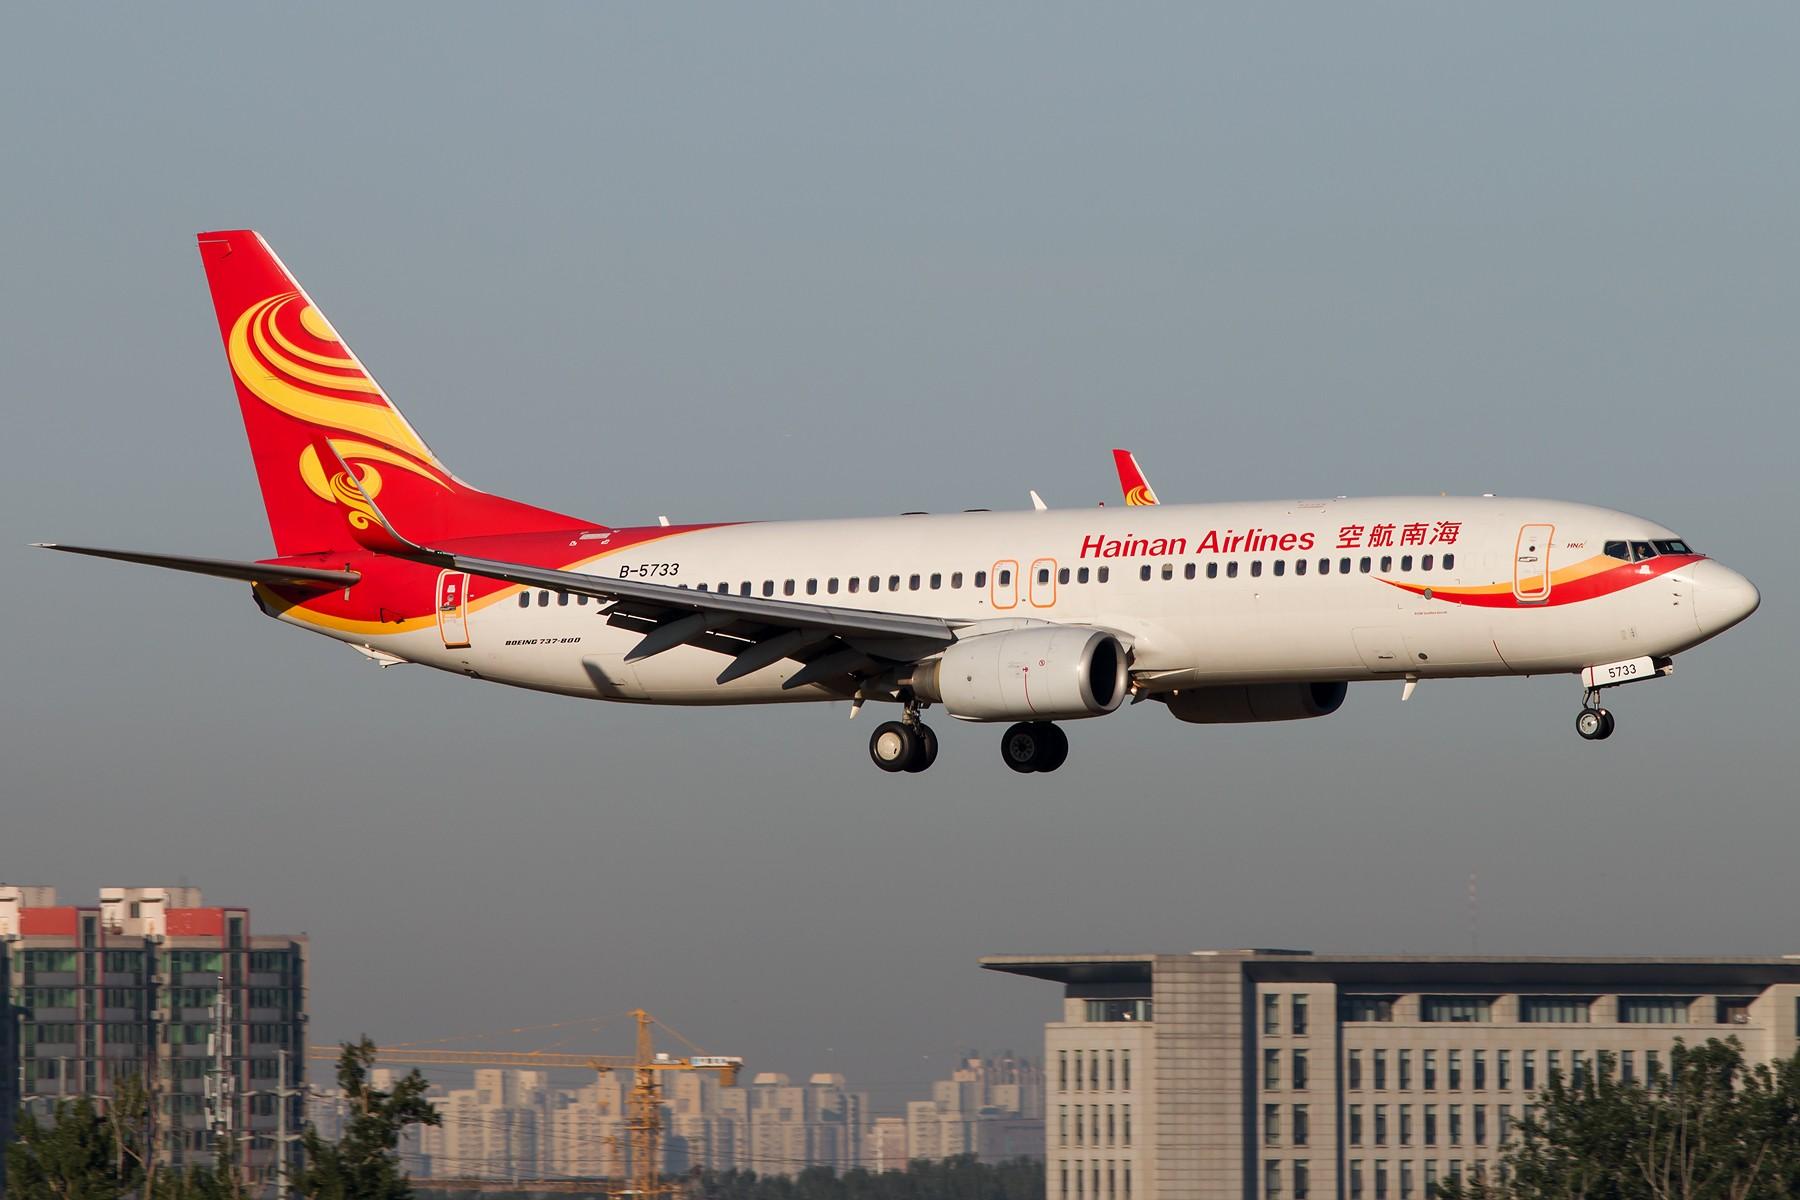 Re:[原创]周末晨练10张 1800*1200 BOEING 737-800 B-5733 中国北京首都国际机场